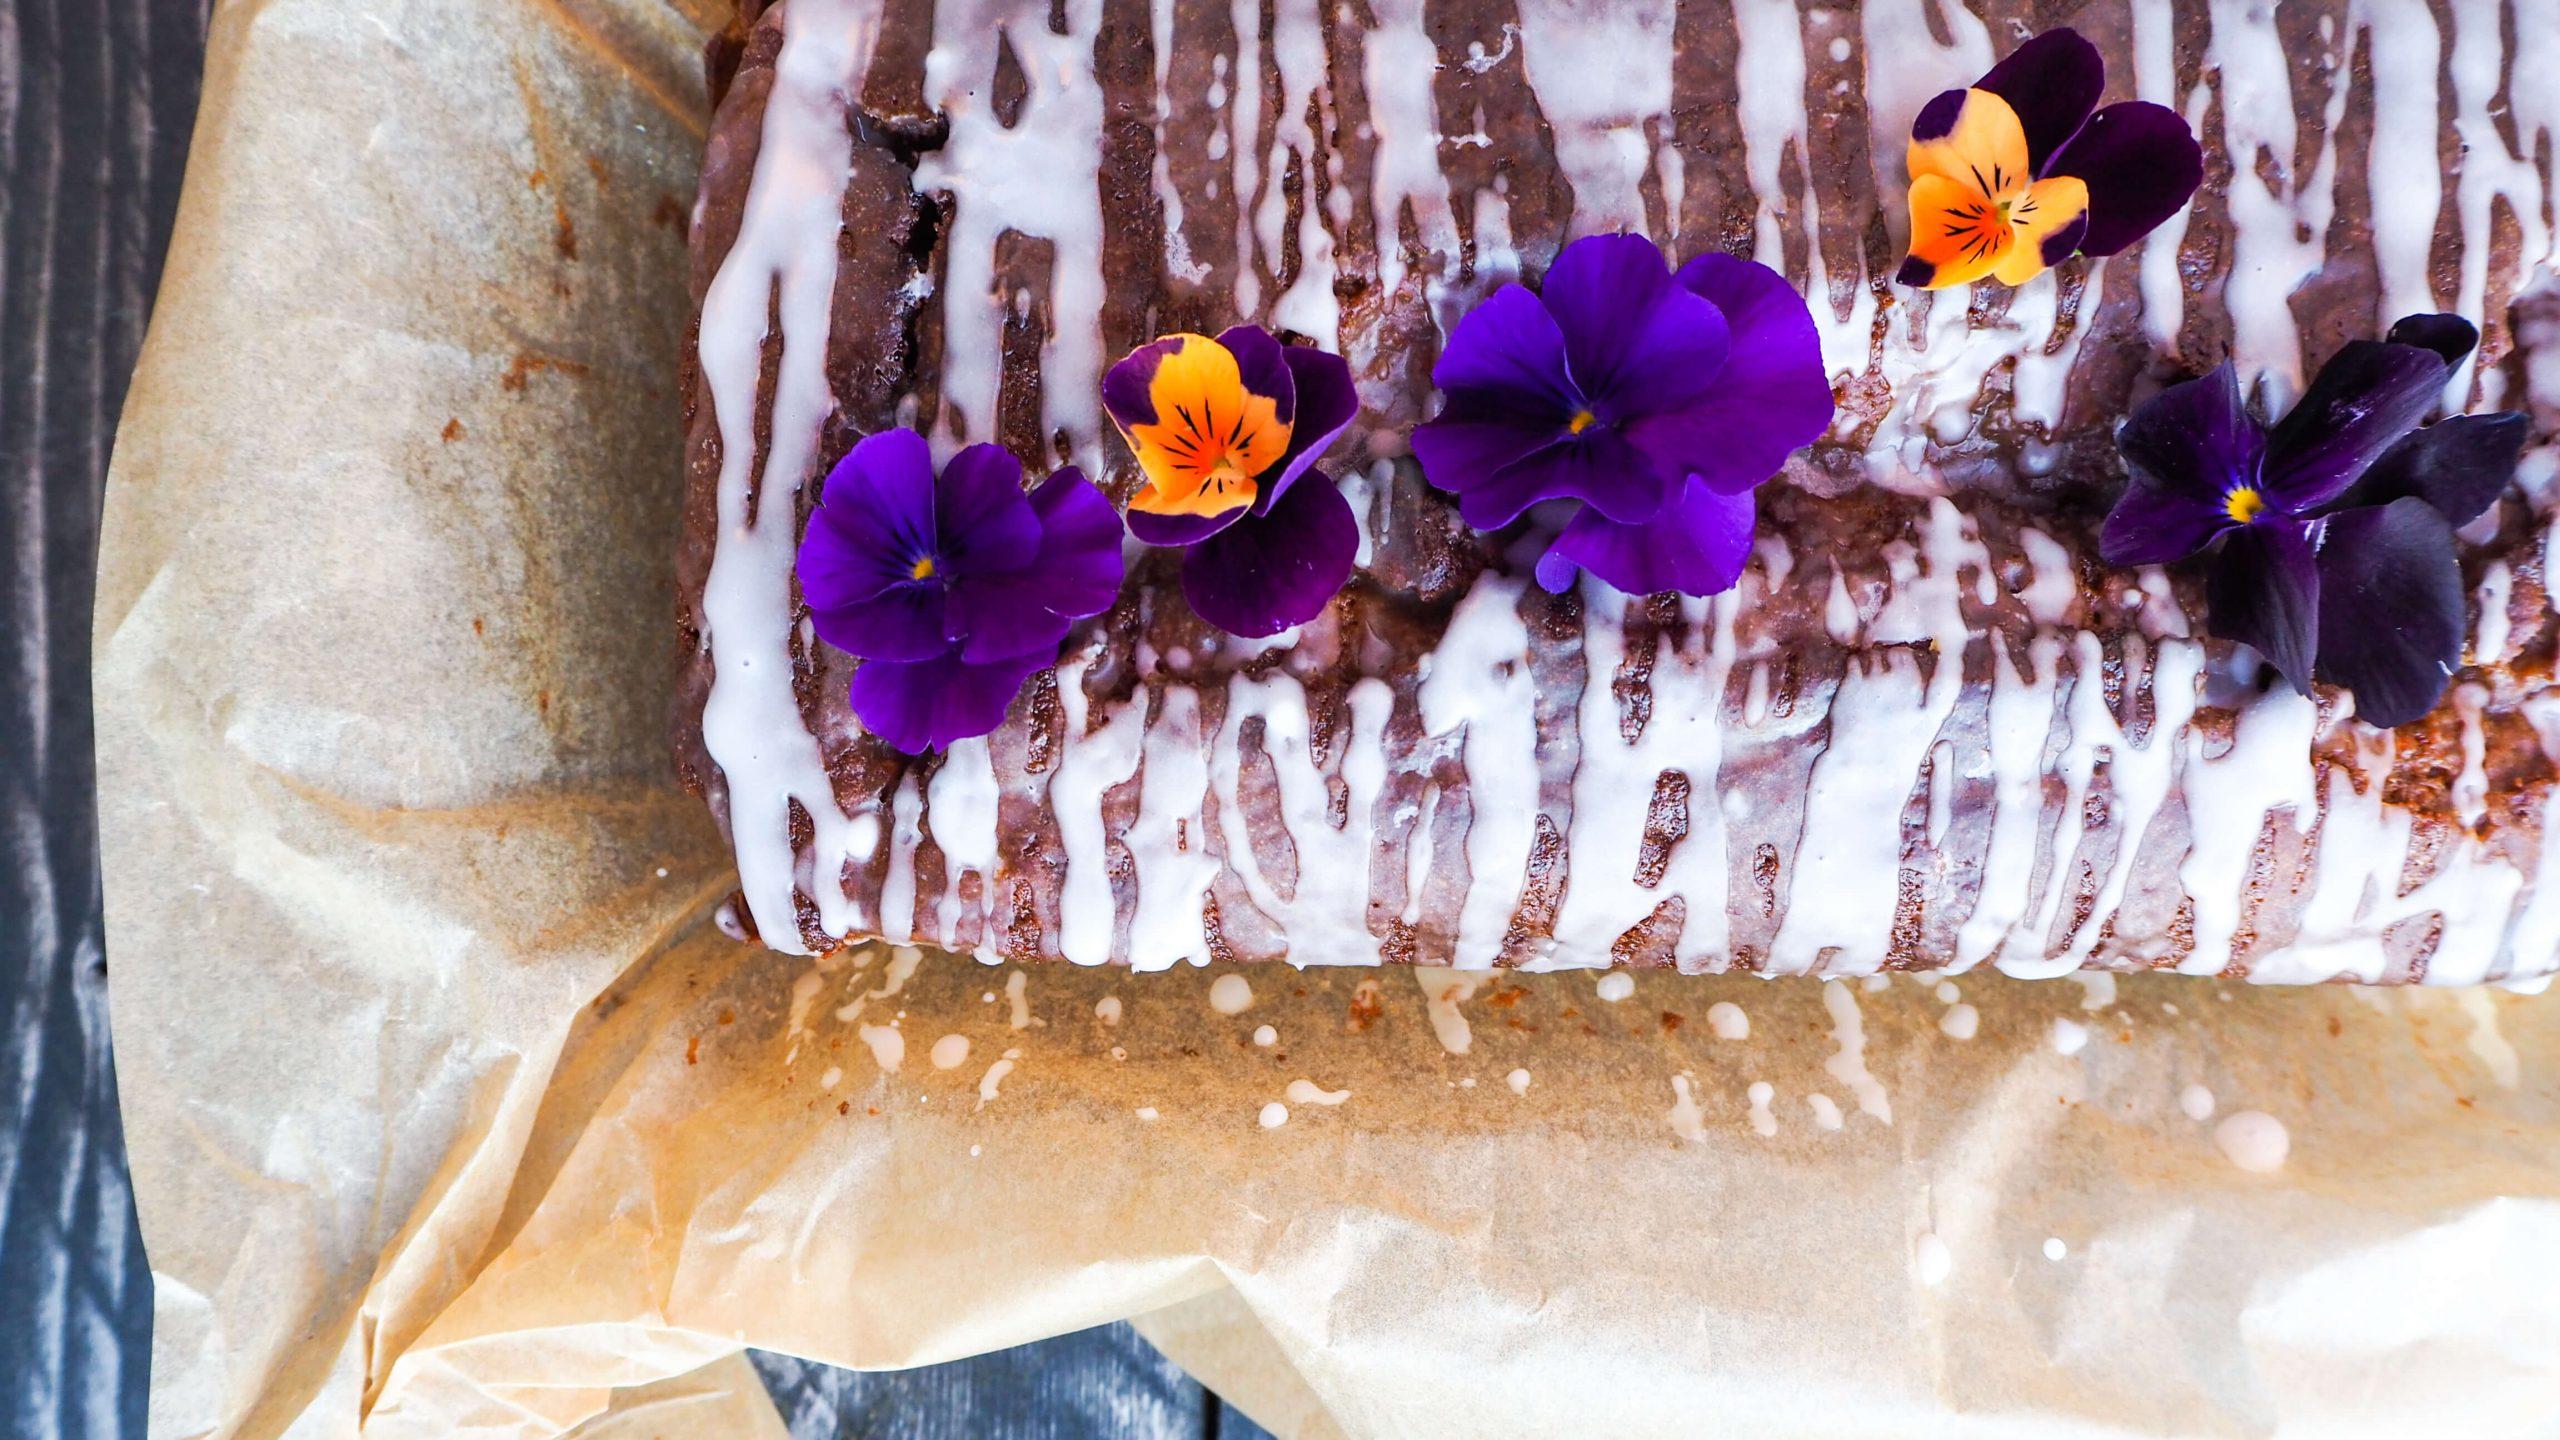 Belly Bakes Week 23: Grapefruit & orange loaf cake recipe